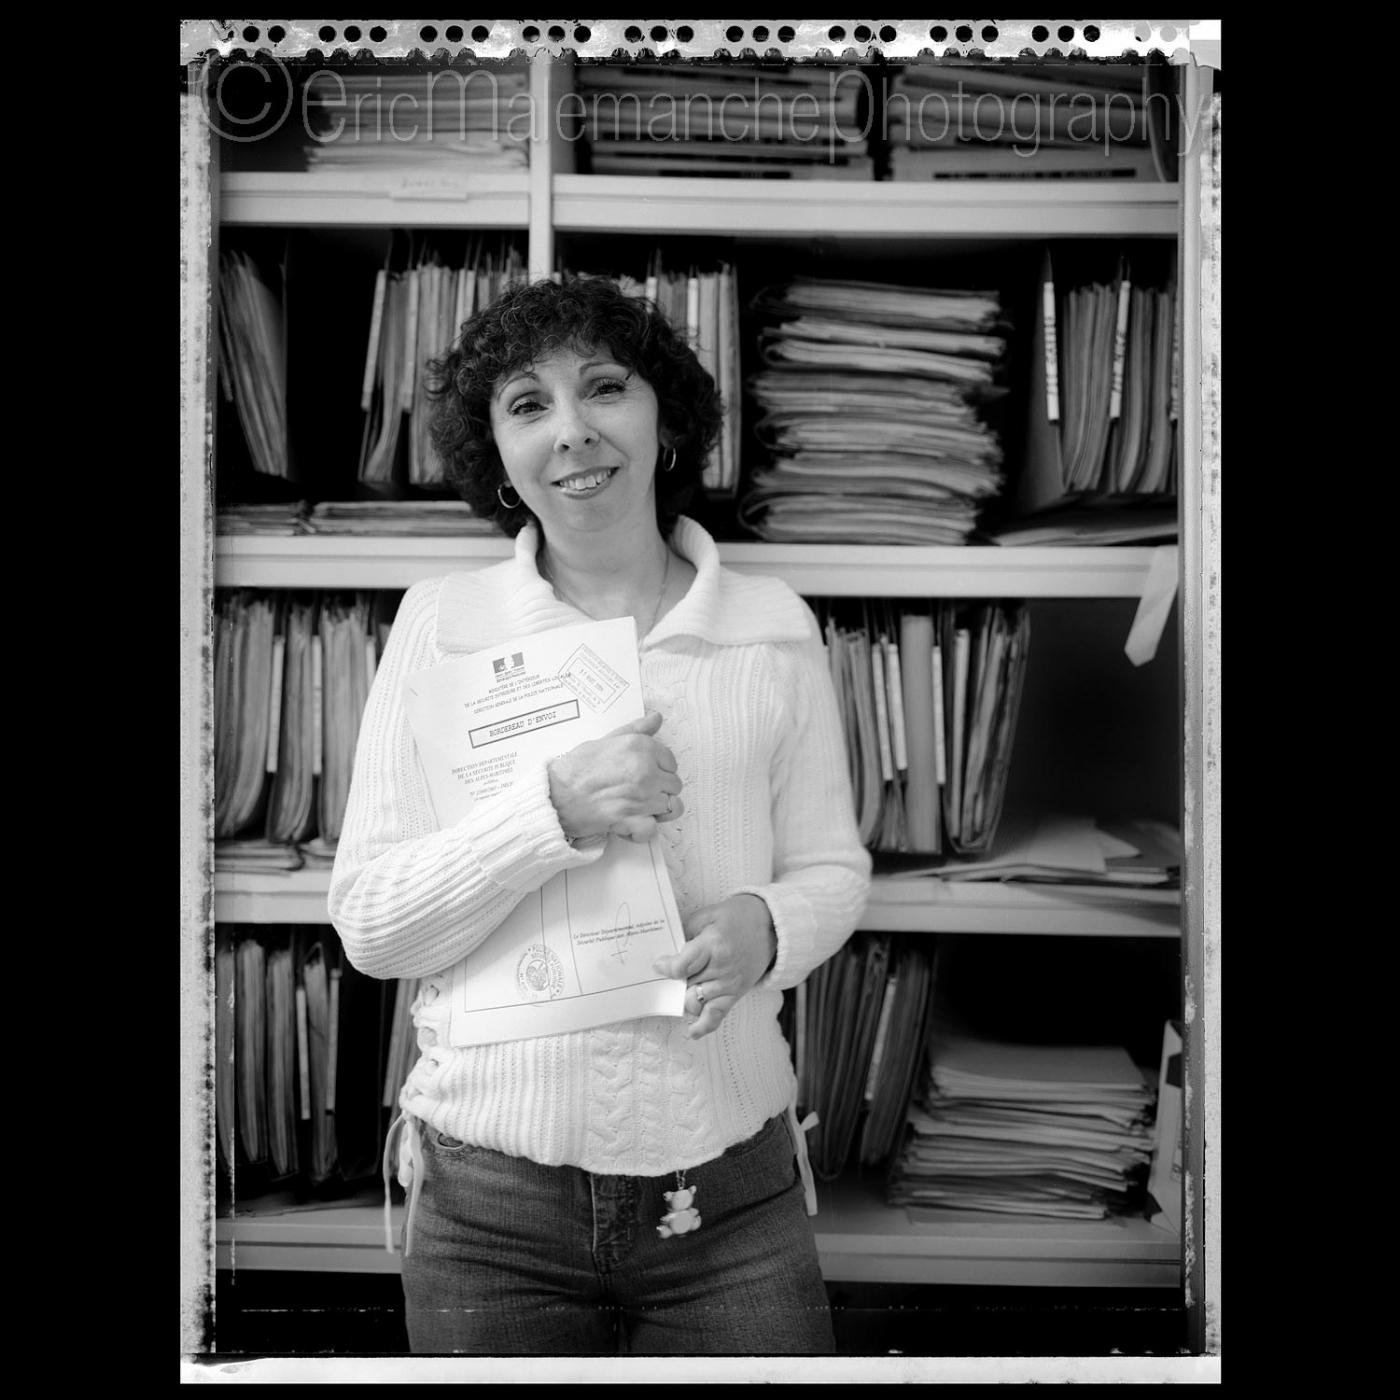 https://www.ericmalemanche.com/imagess/topics/andar/liste/Andar-Sylvie.jpg